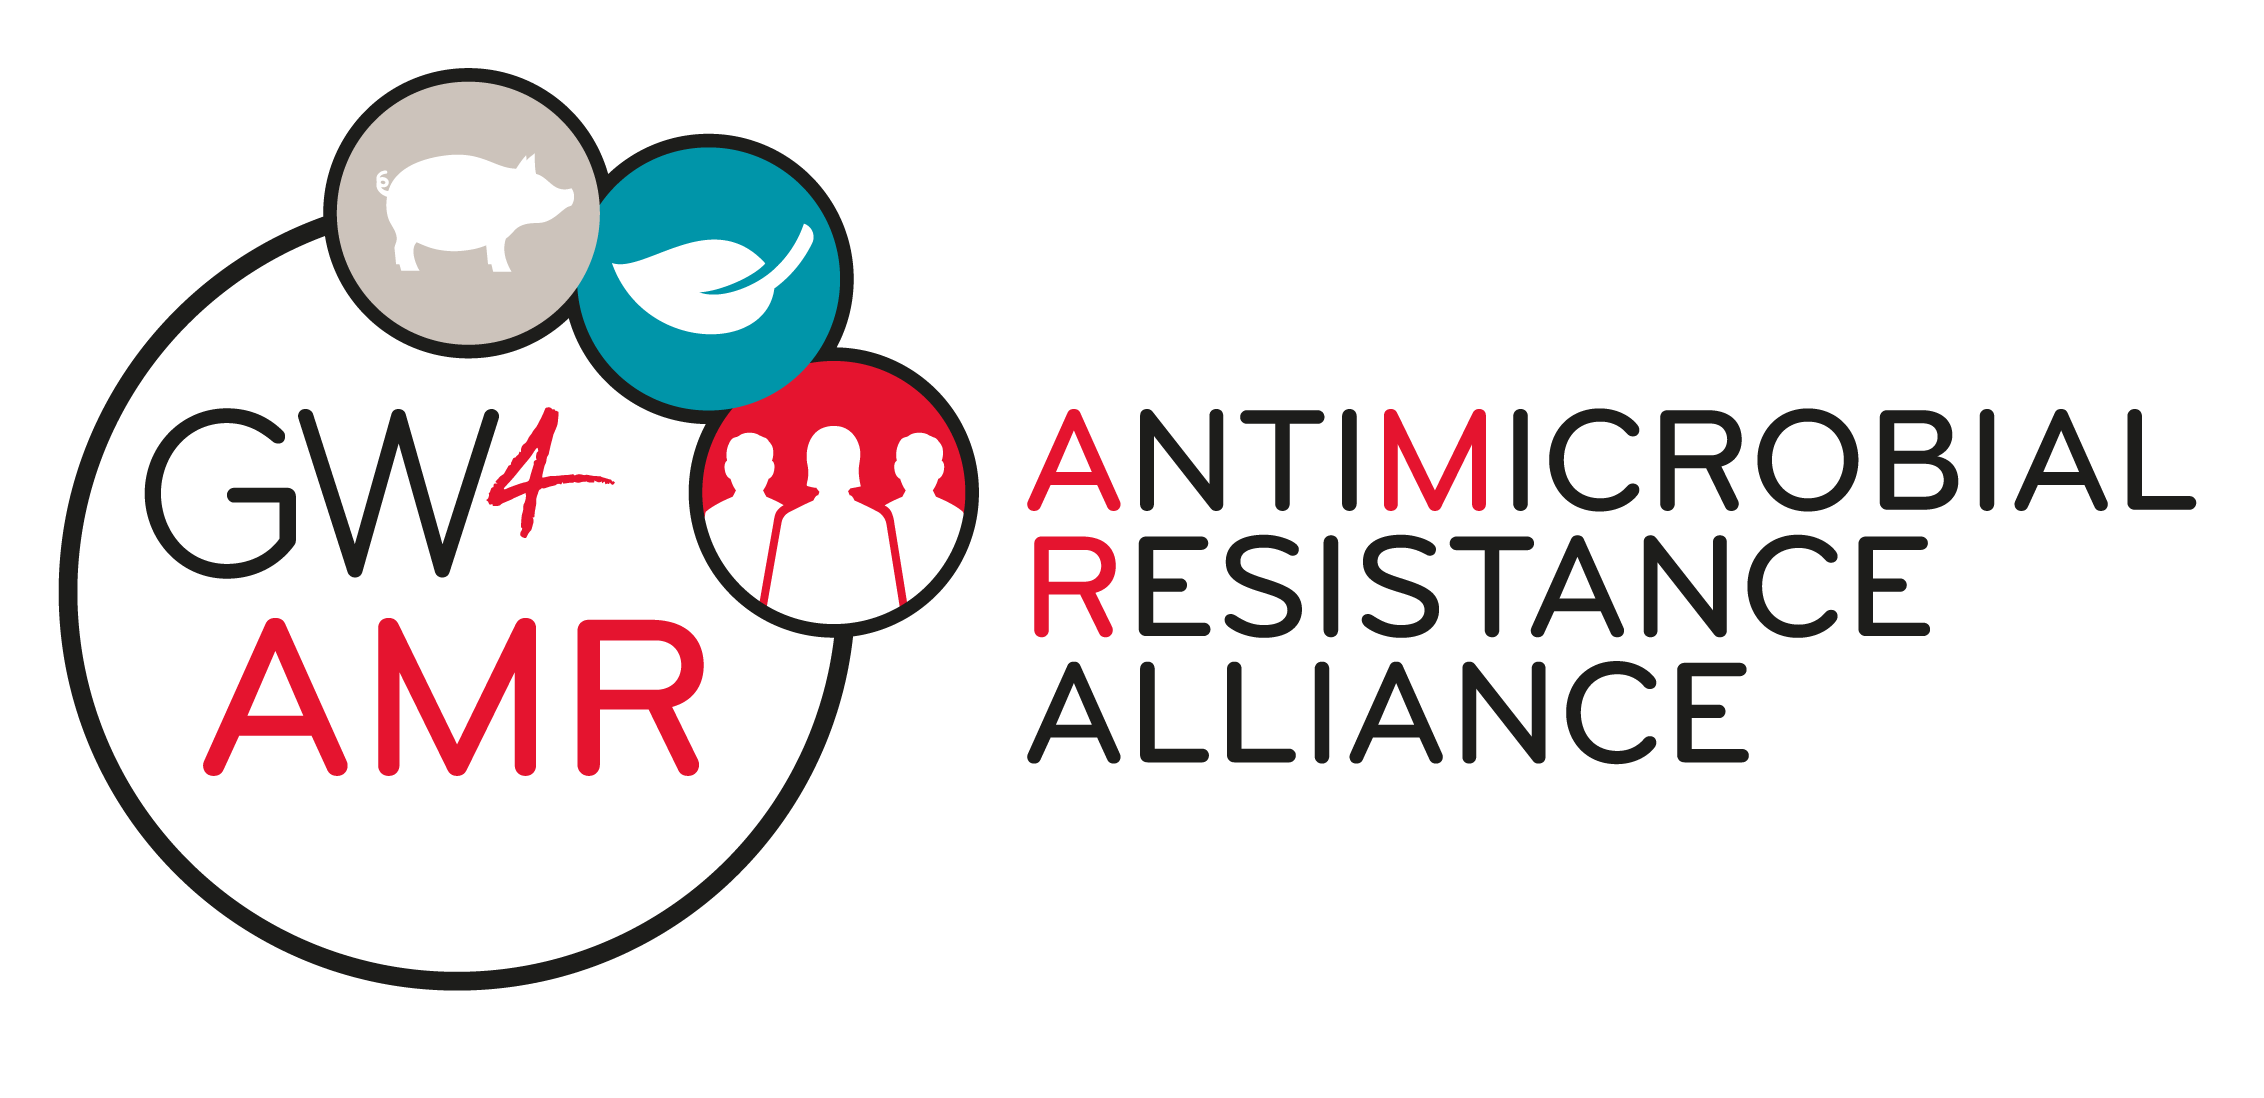 GW4 Antimicrobial Resistance Alliance